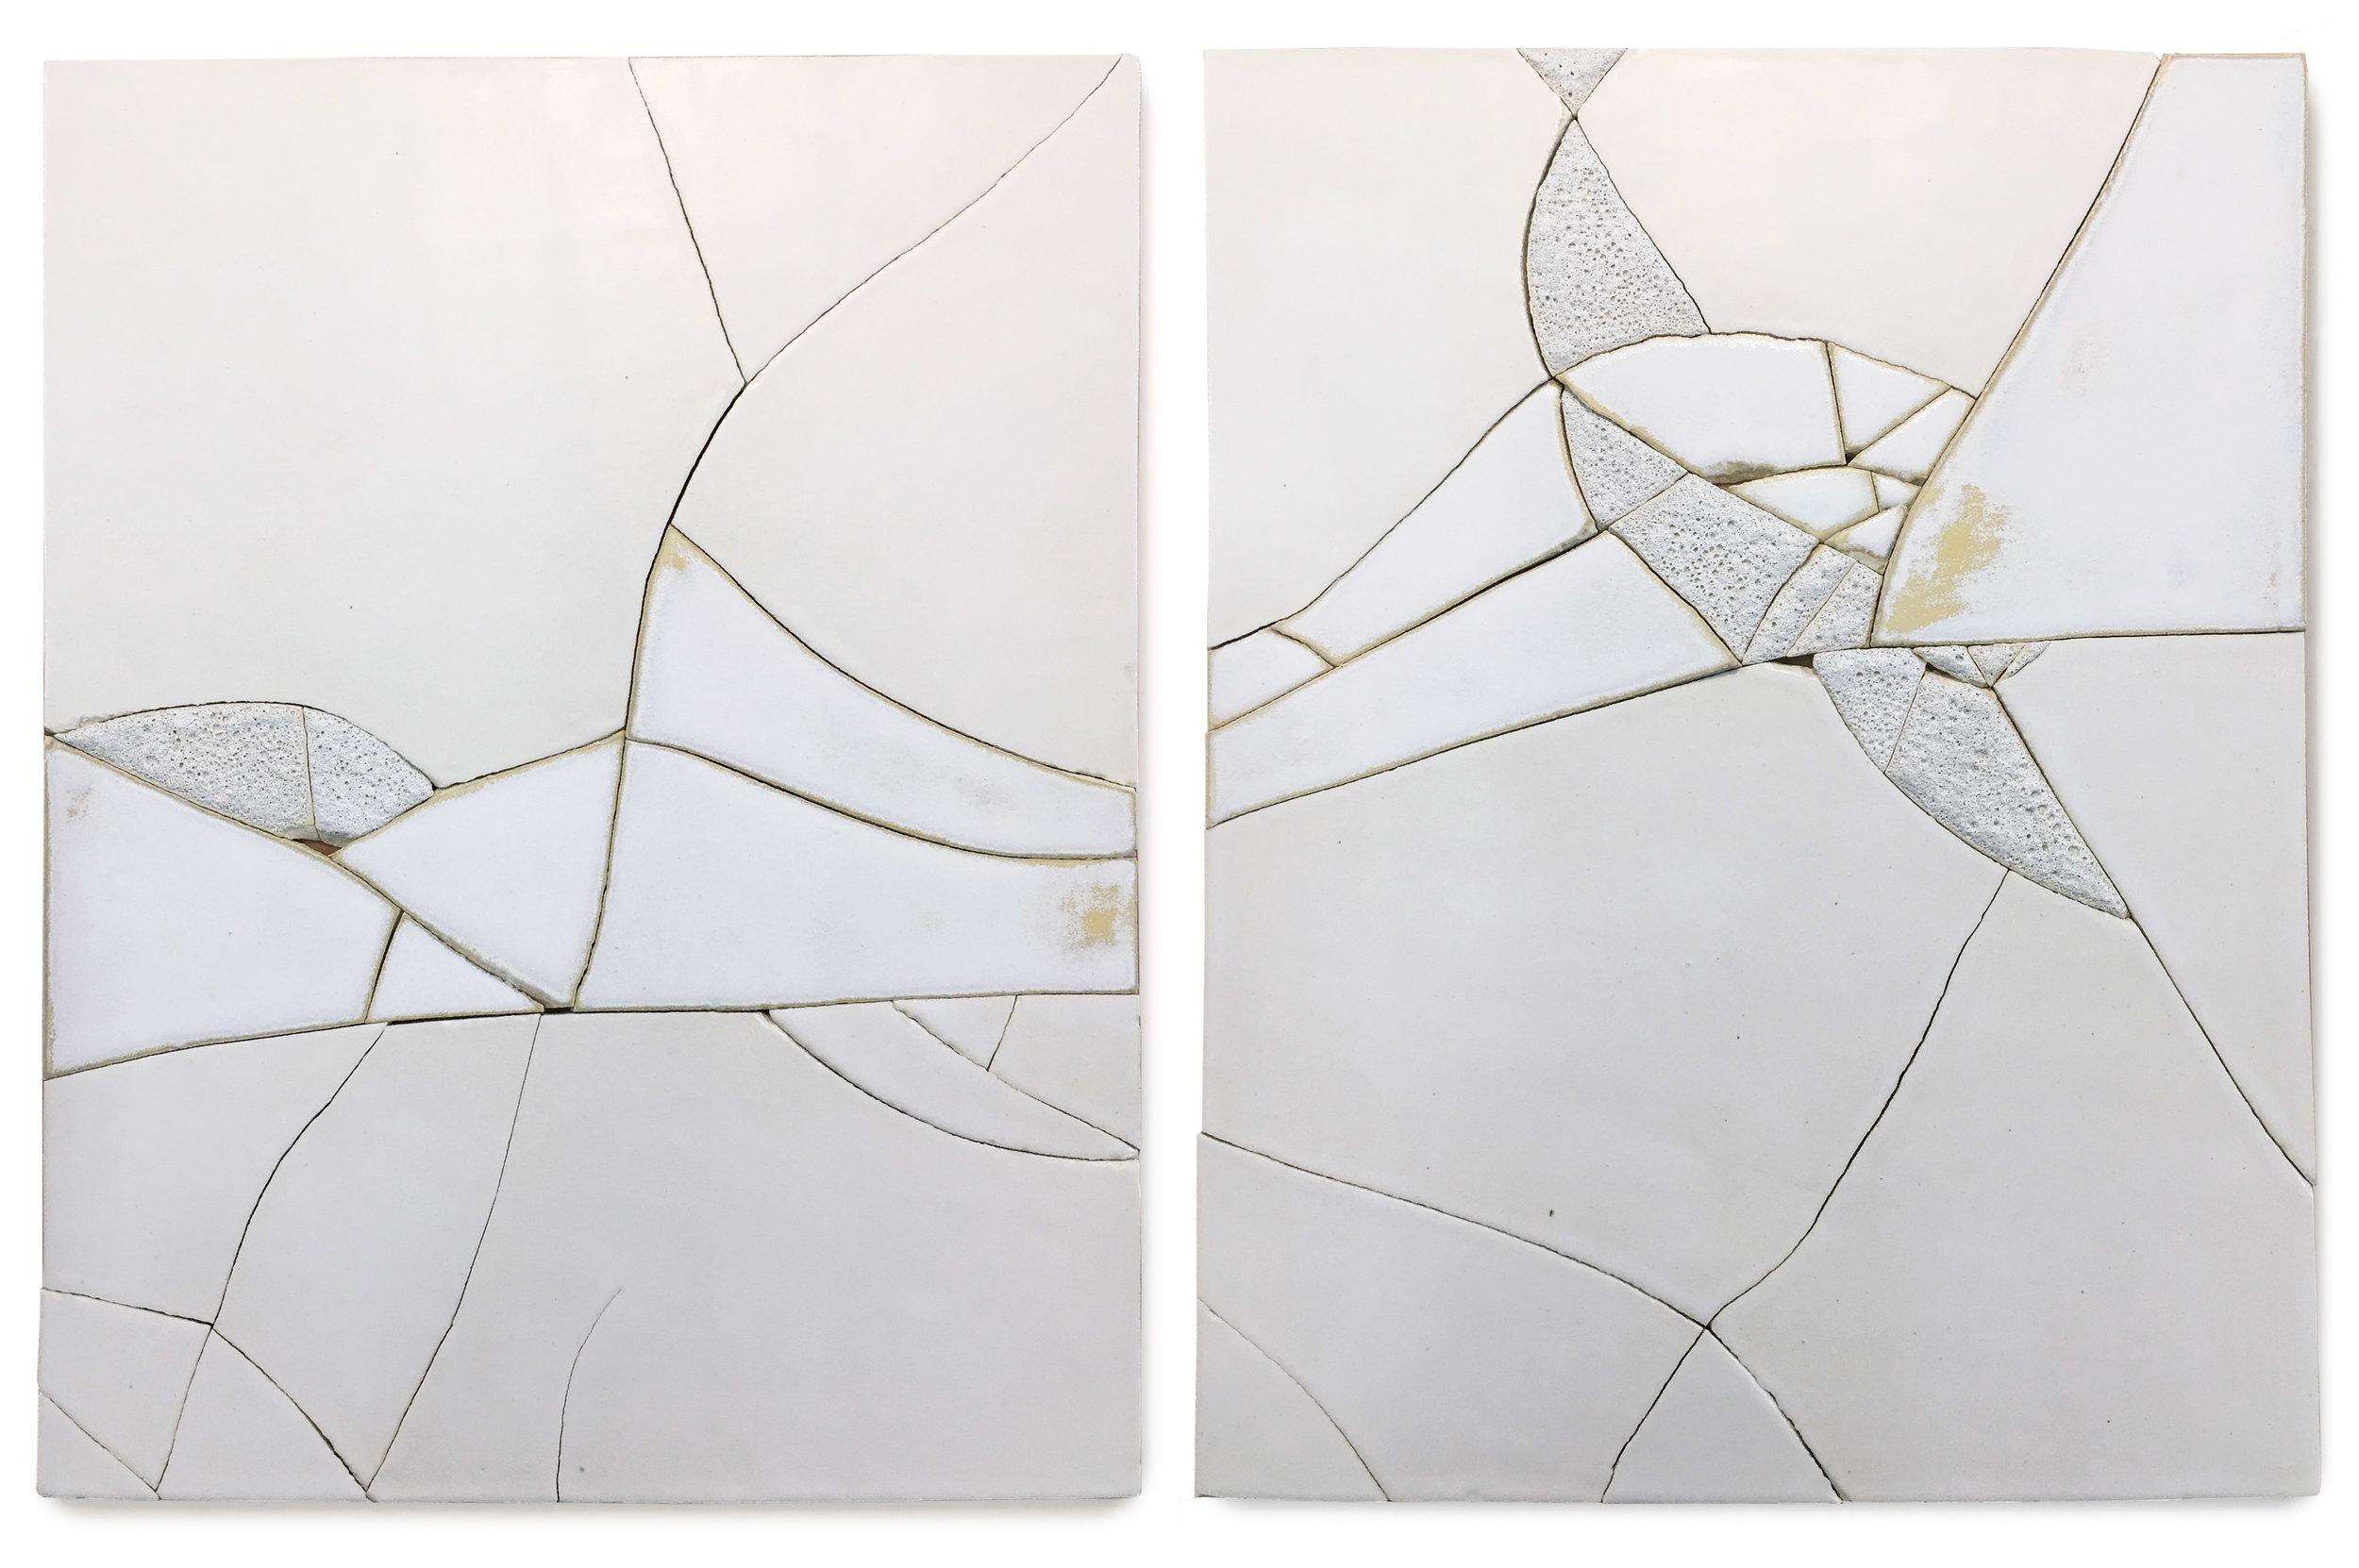 Iceberg II   • Set of 2 panels, 14 x 18 inches each